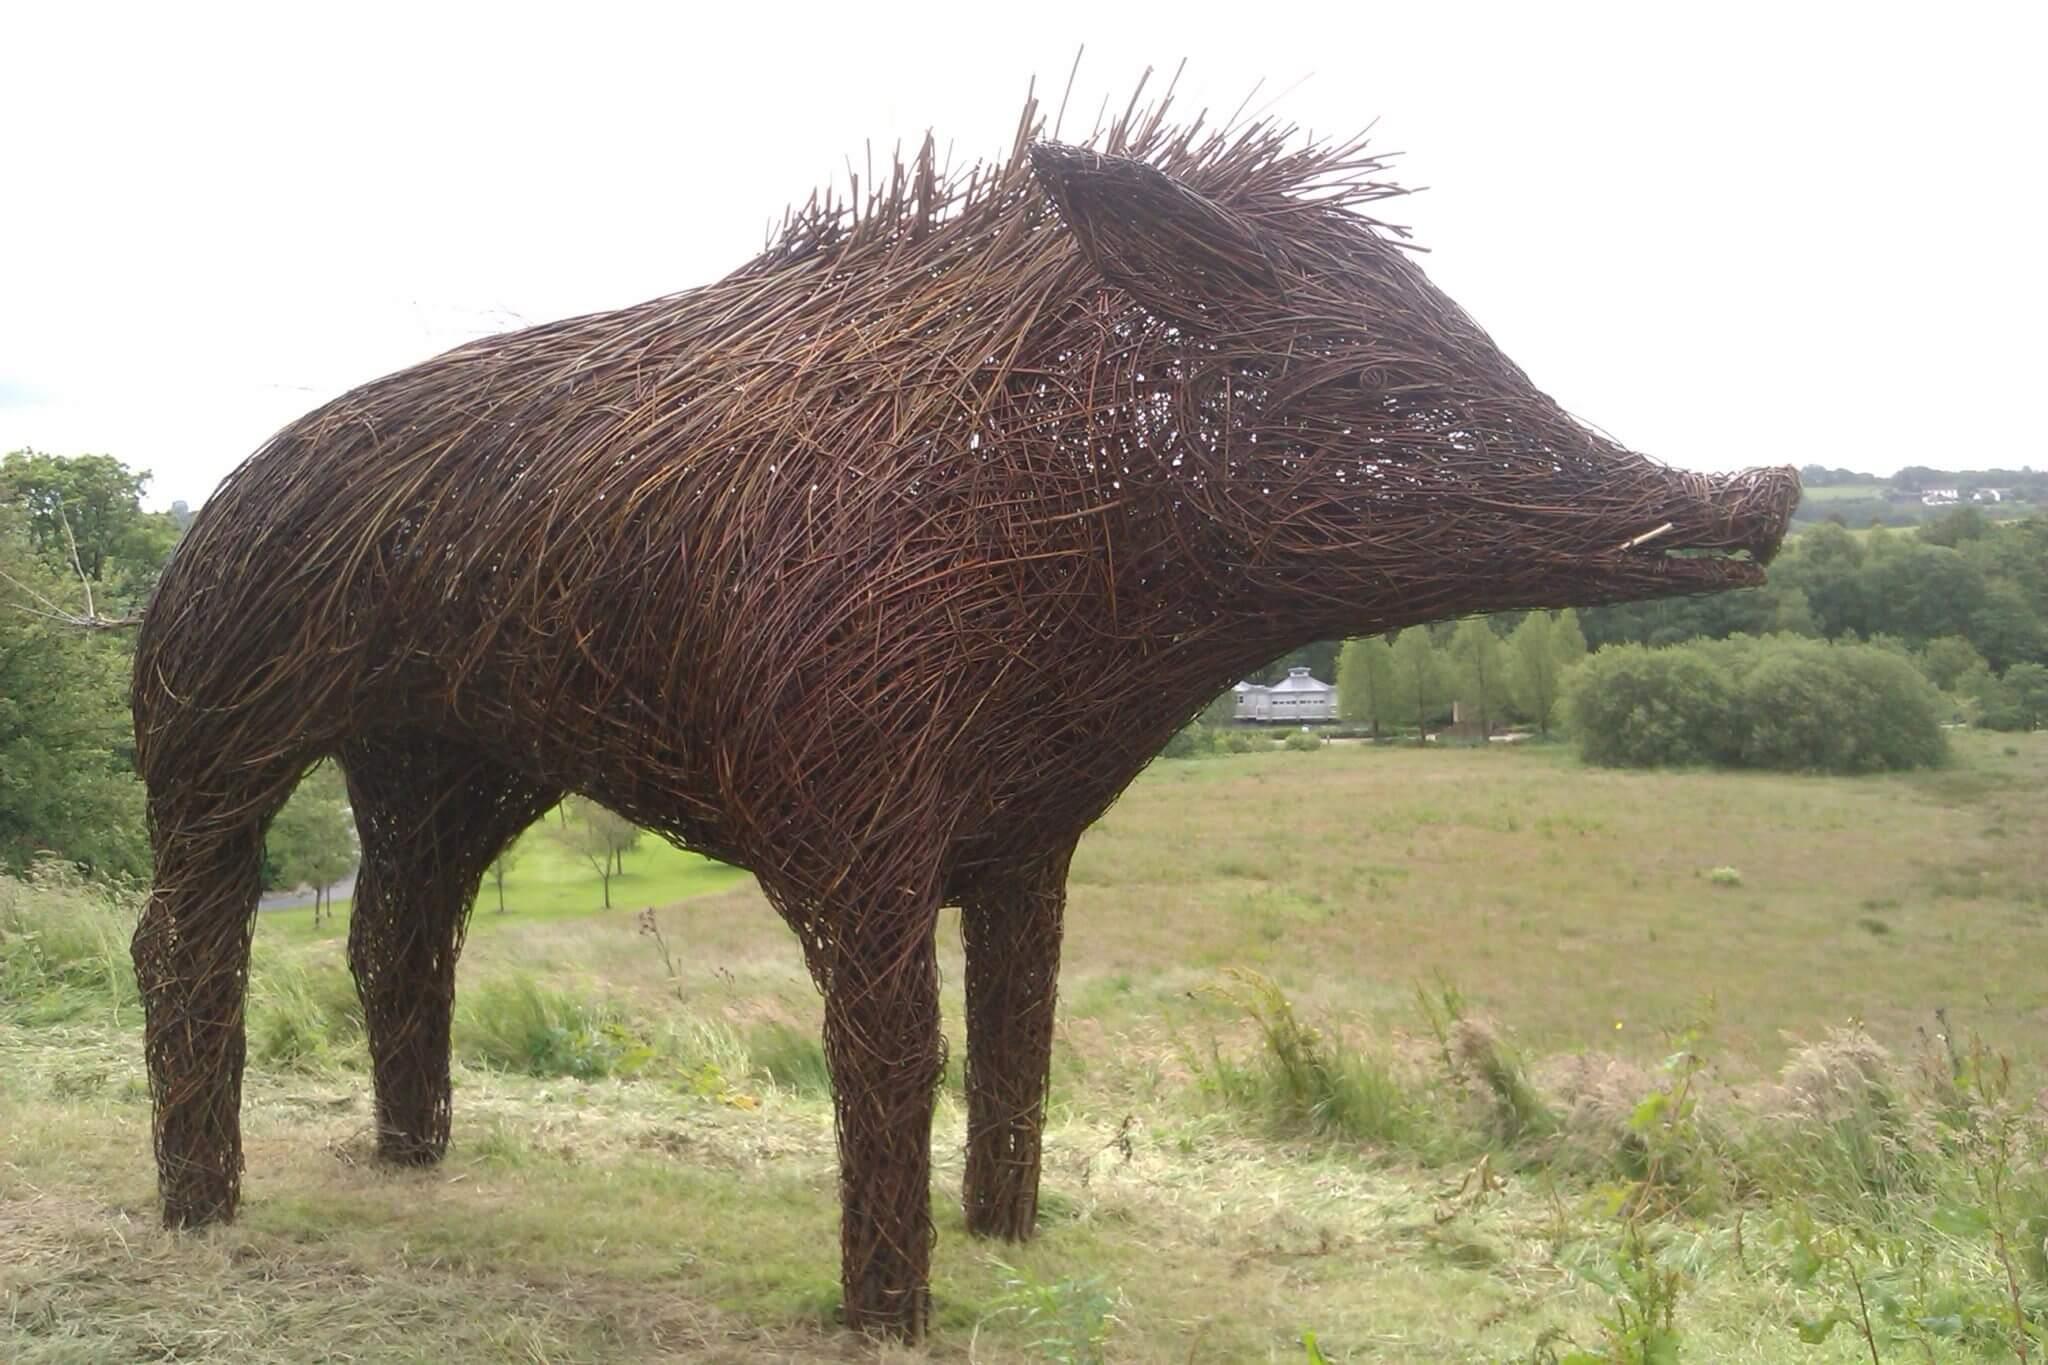 Wild boar at National Botanic Garden of Wales